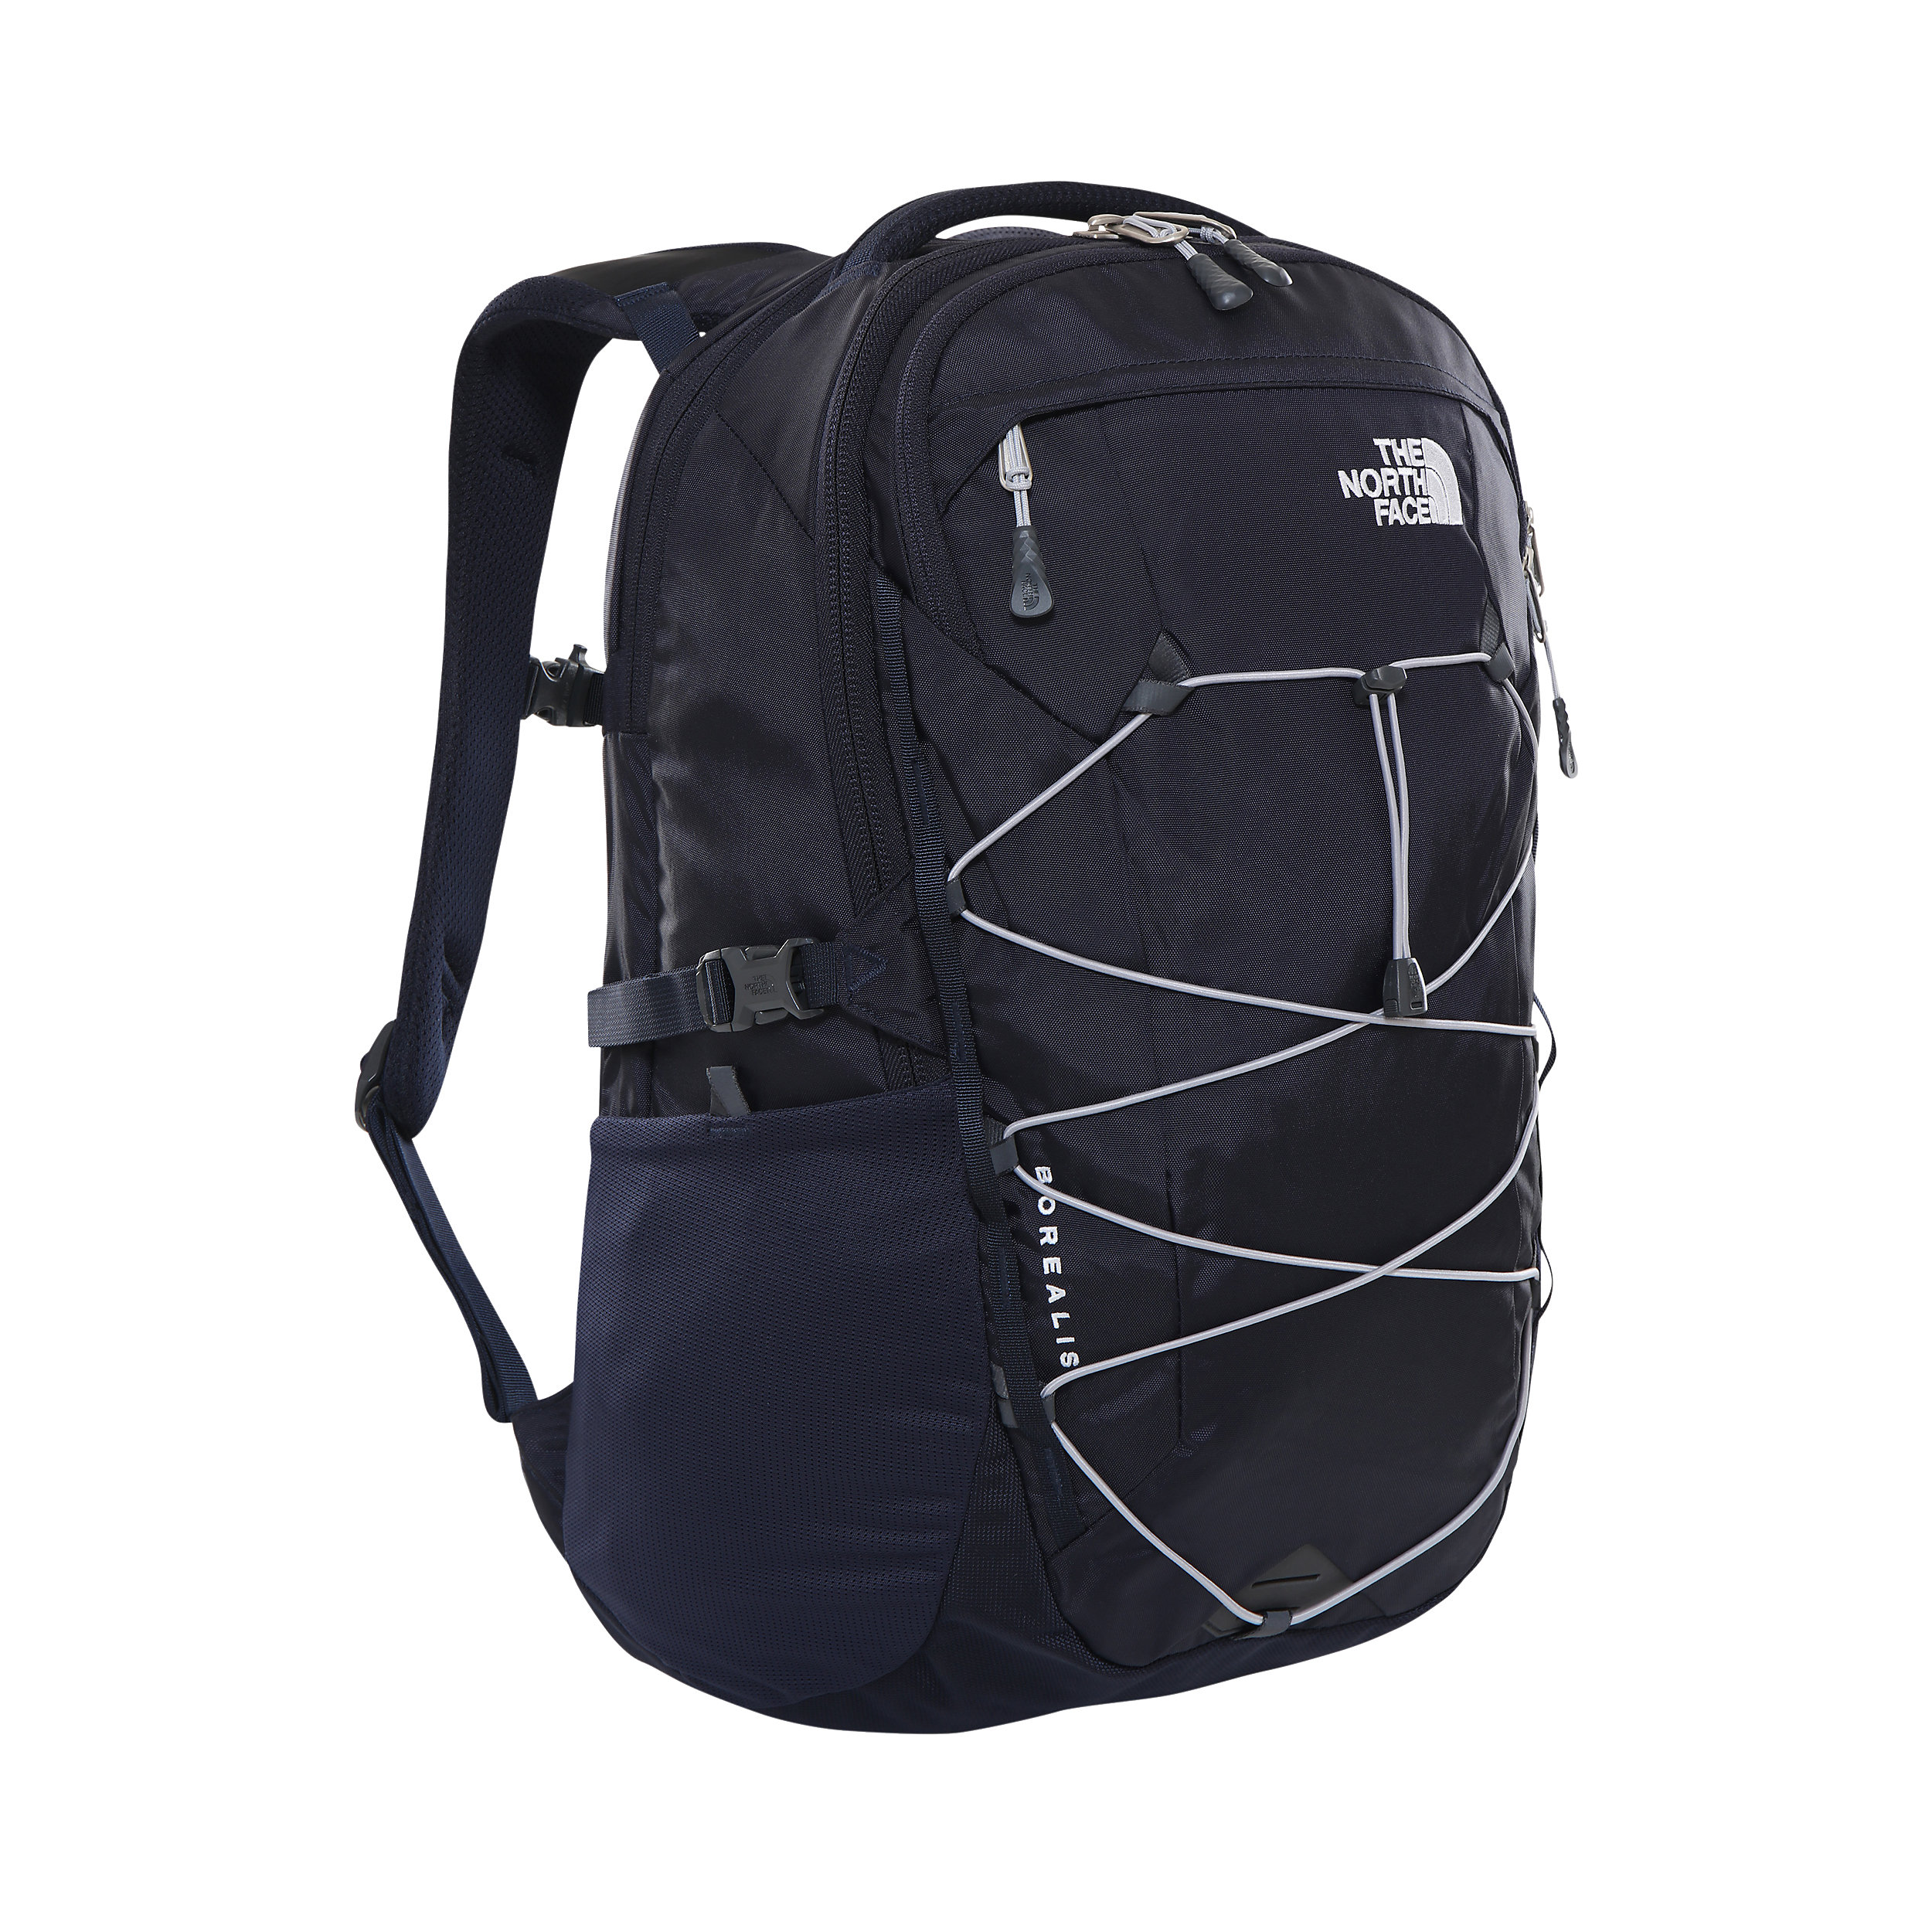 "Backpack Borealis 15"" 28 Liter"